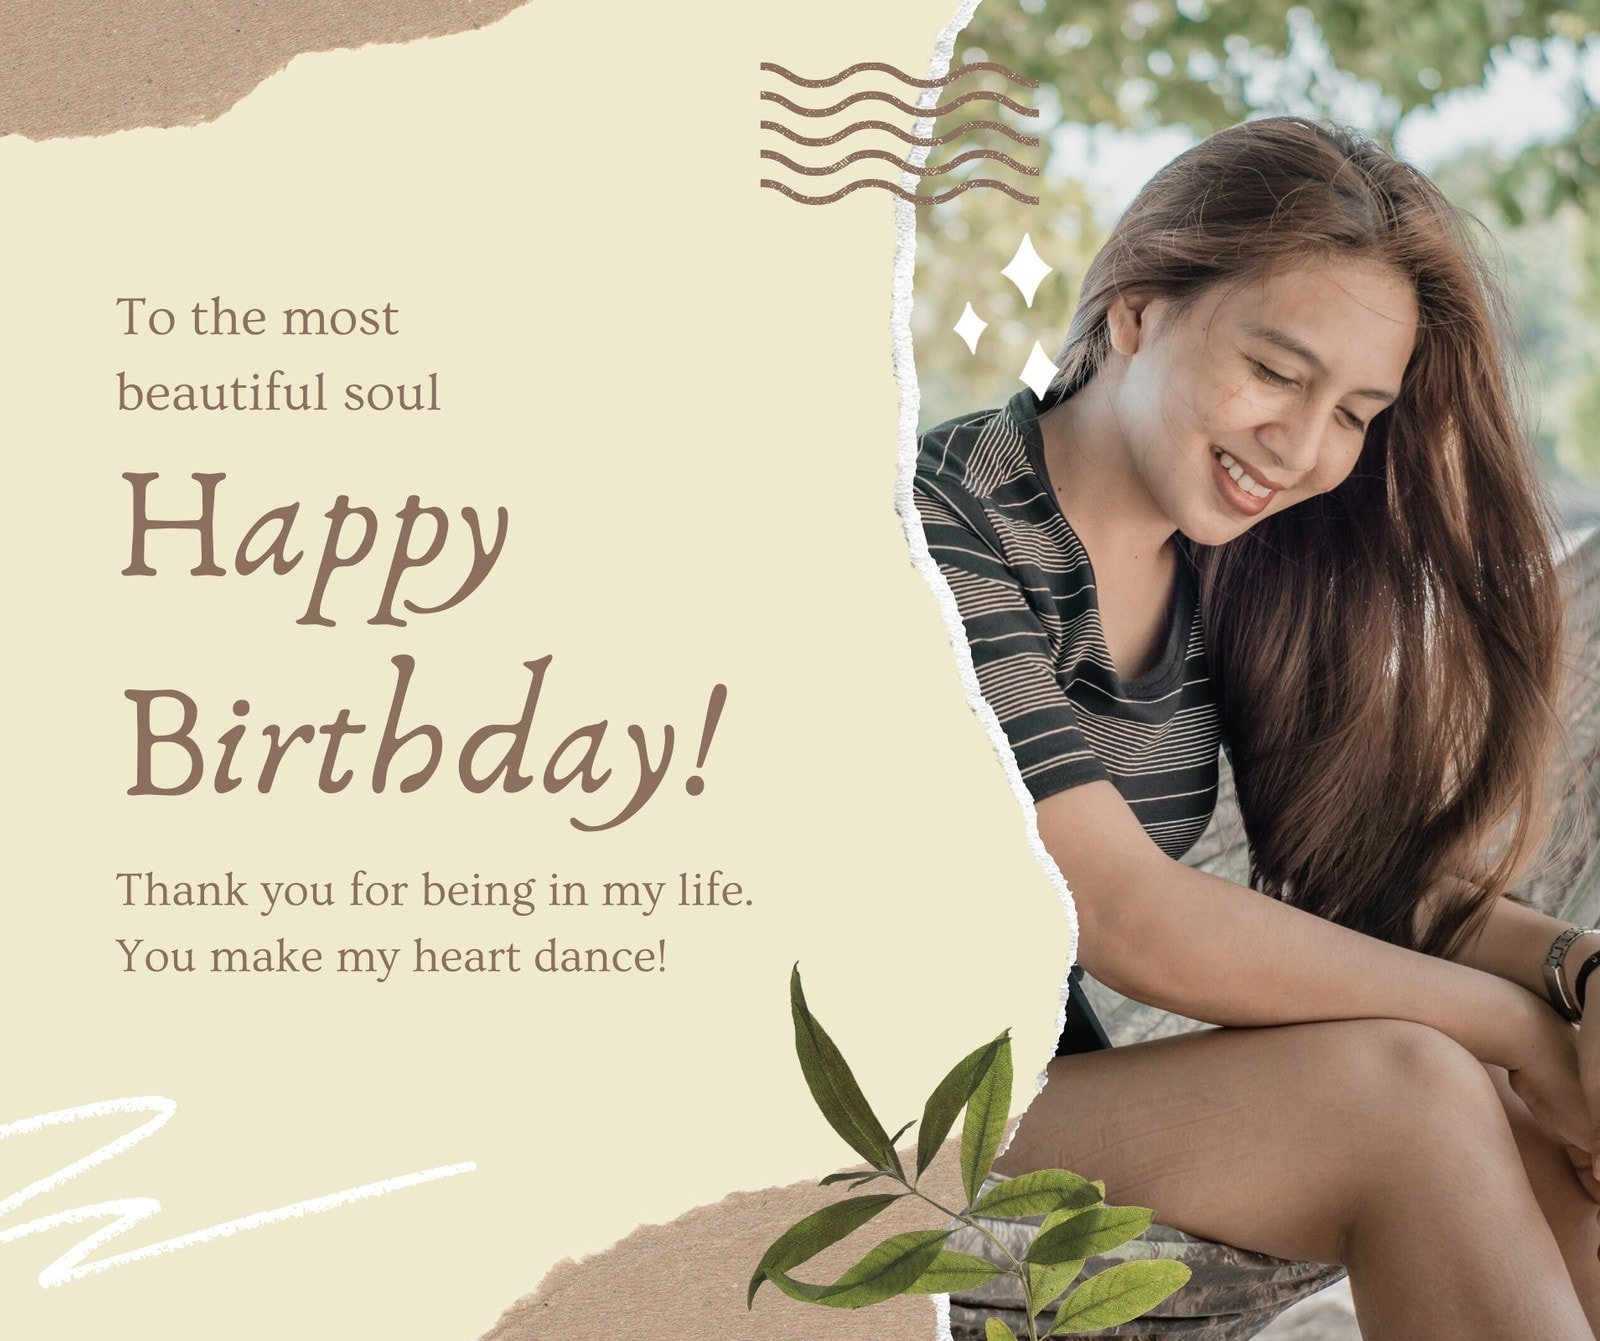 Brown and Beige Moodboard Scrapbook Girlfriend's Birthday Facebook Post